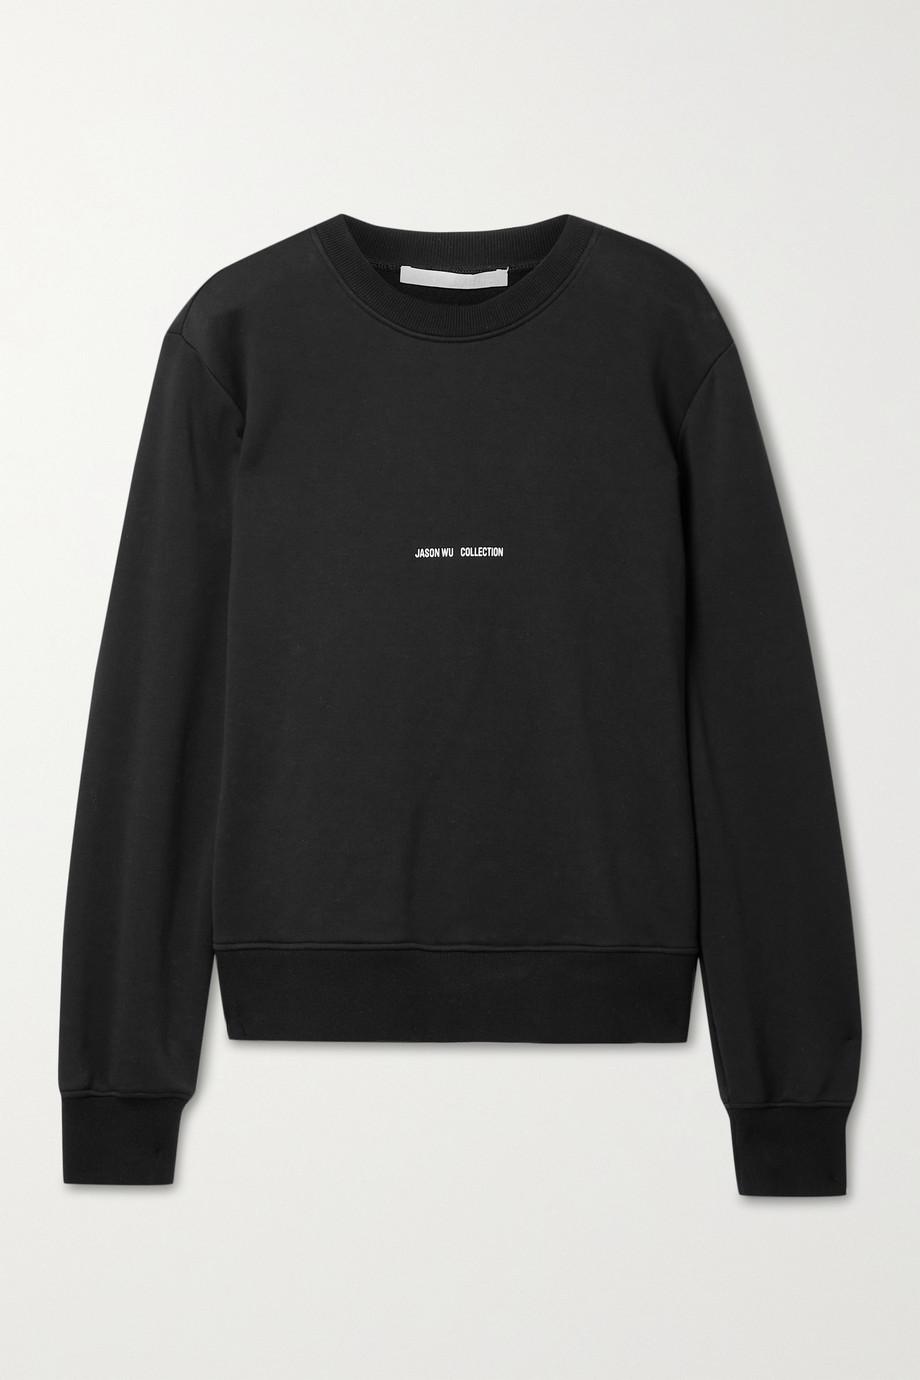 Jason Wu Collection Printed cotton-blend jersey sweatshirt